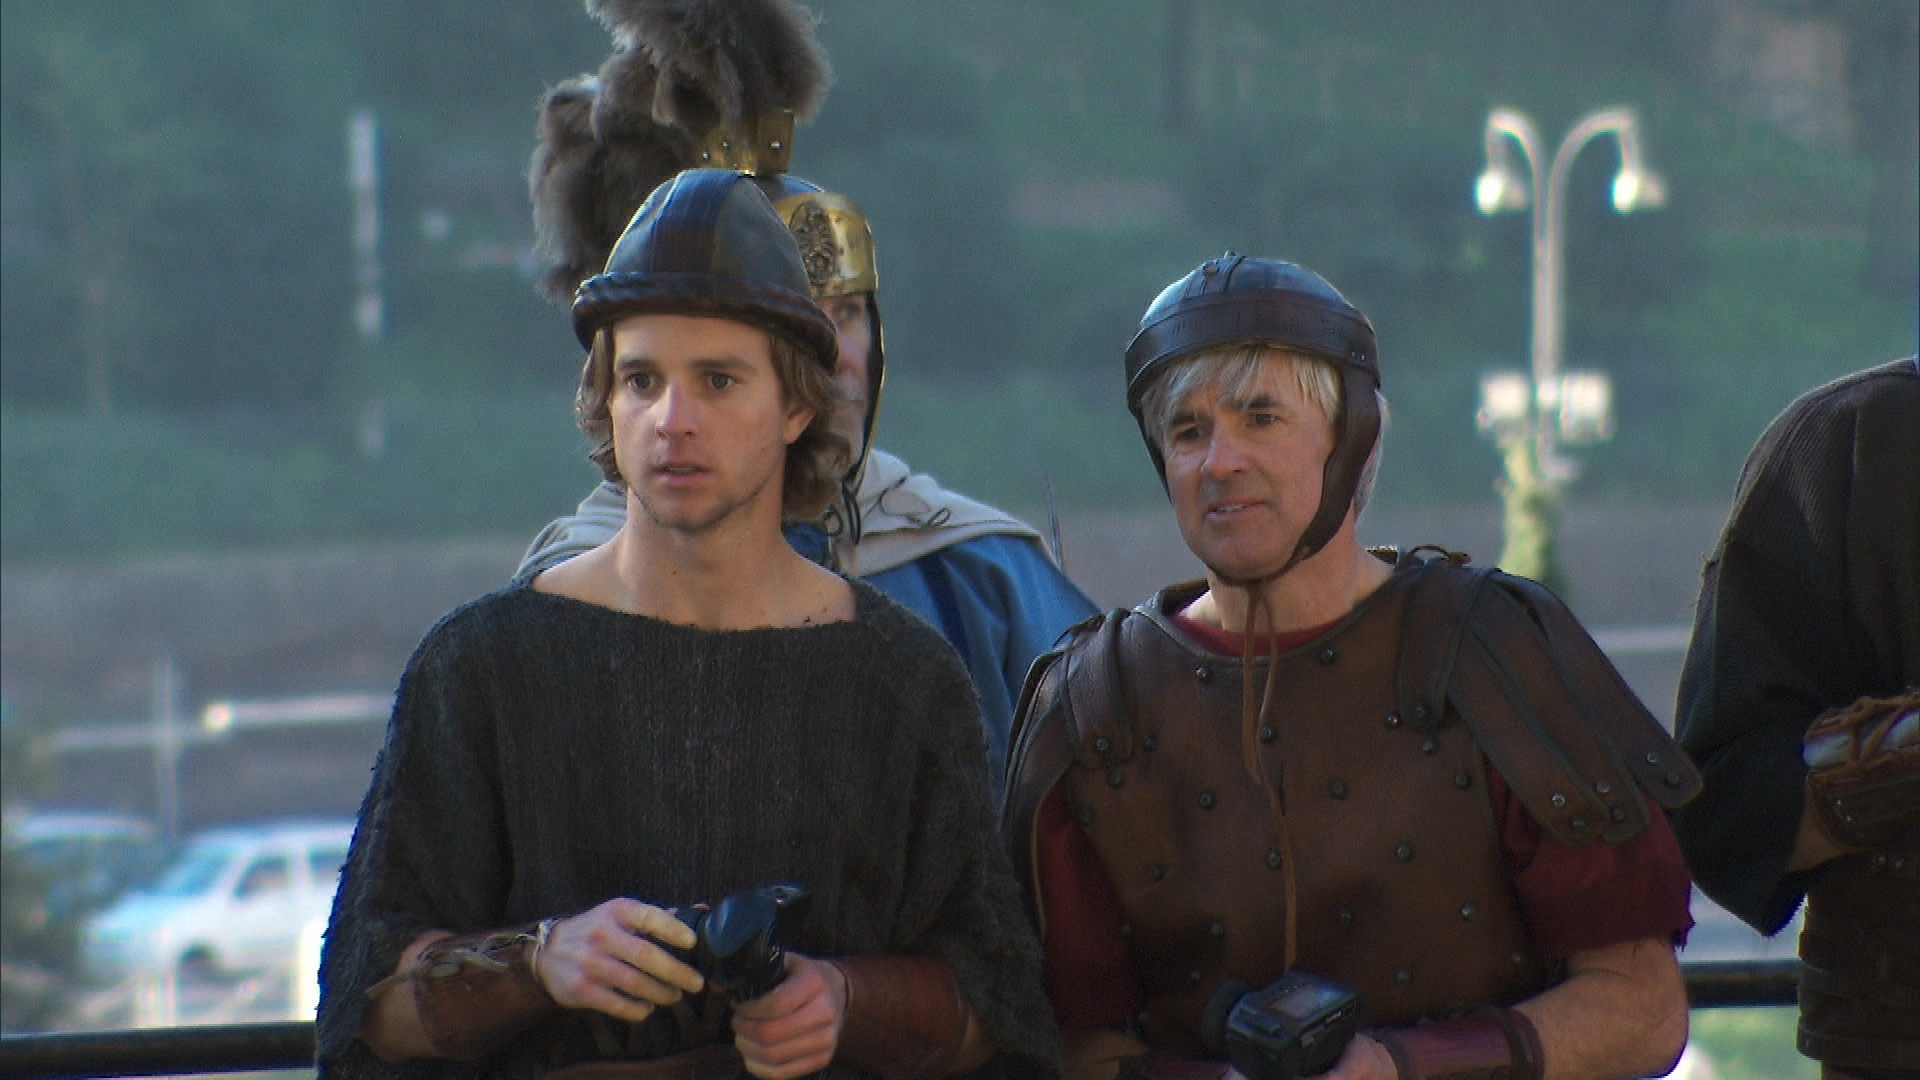 Connor and David in Season 24 Episode 7